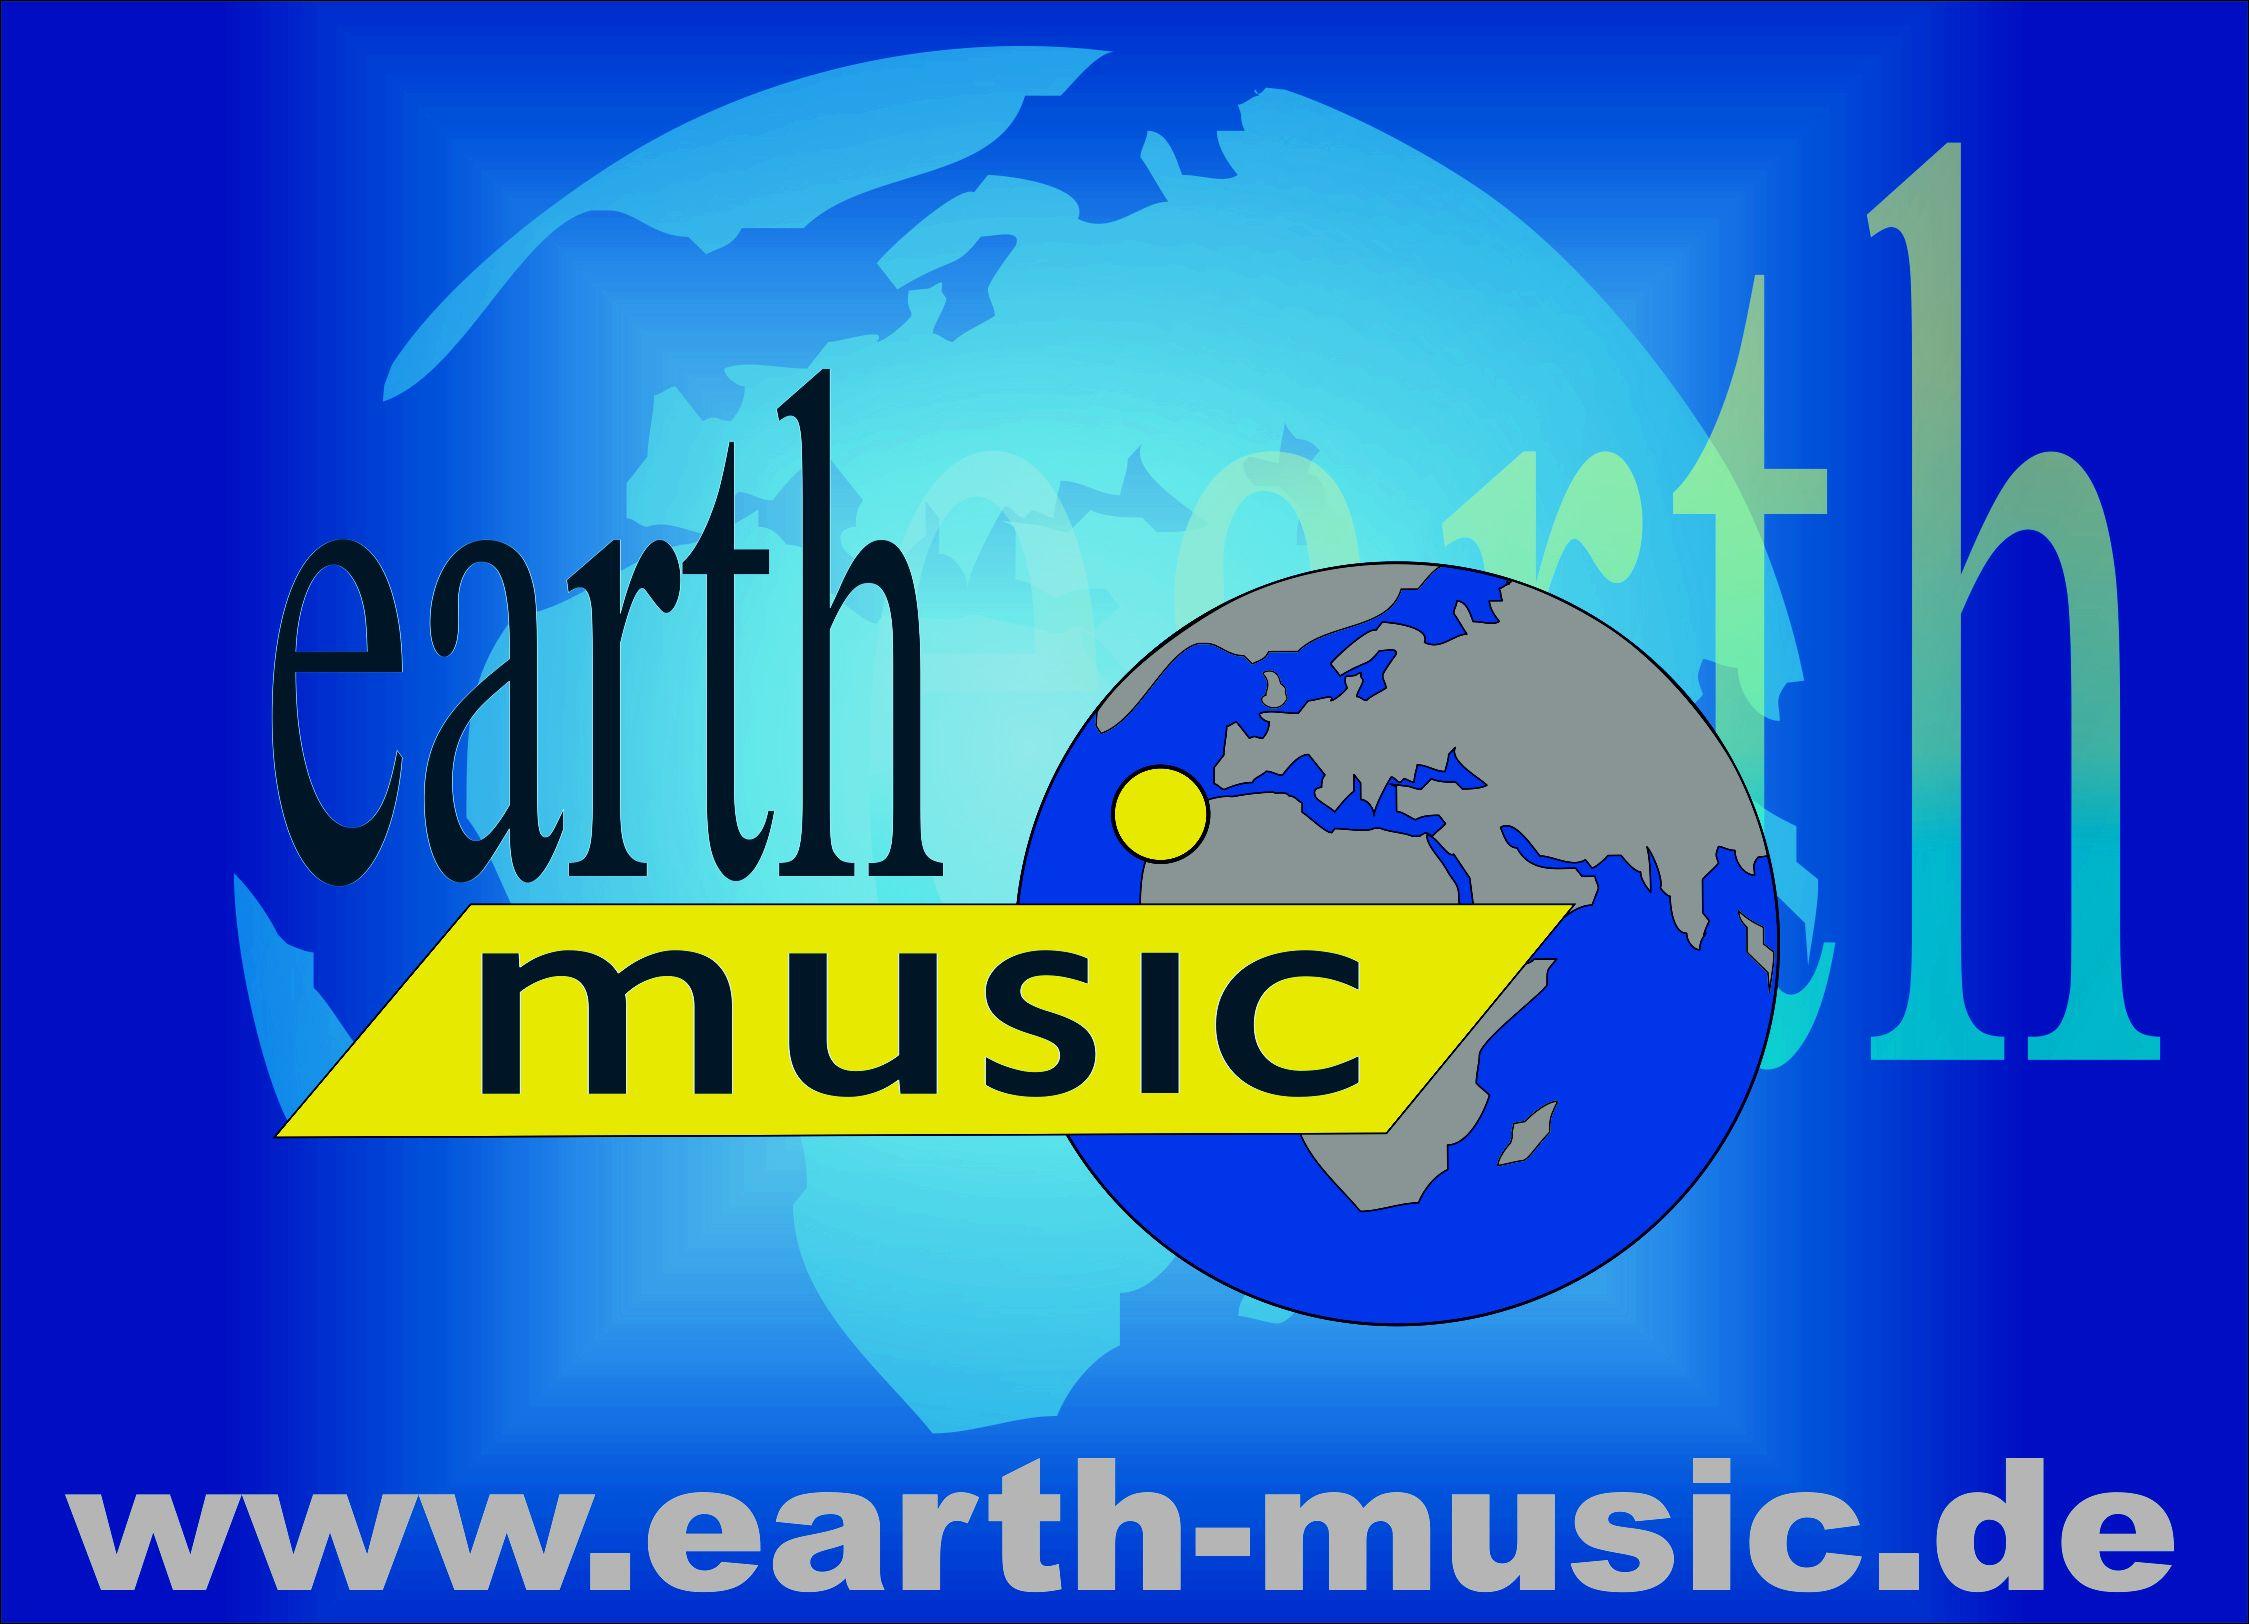 EARTH-MUSIC - Studio/Technik/Konzerthalle